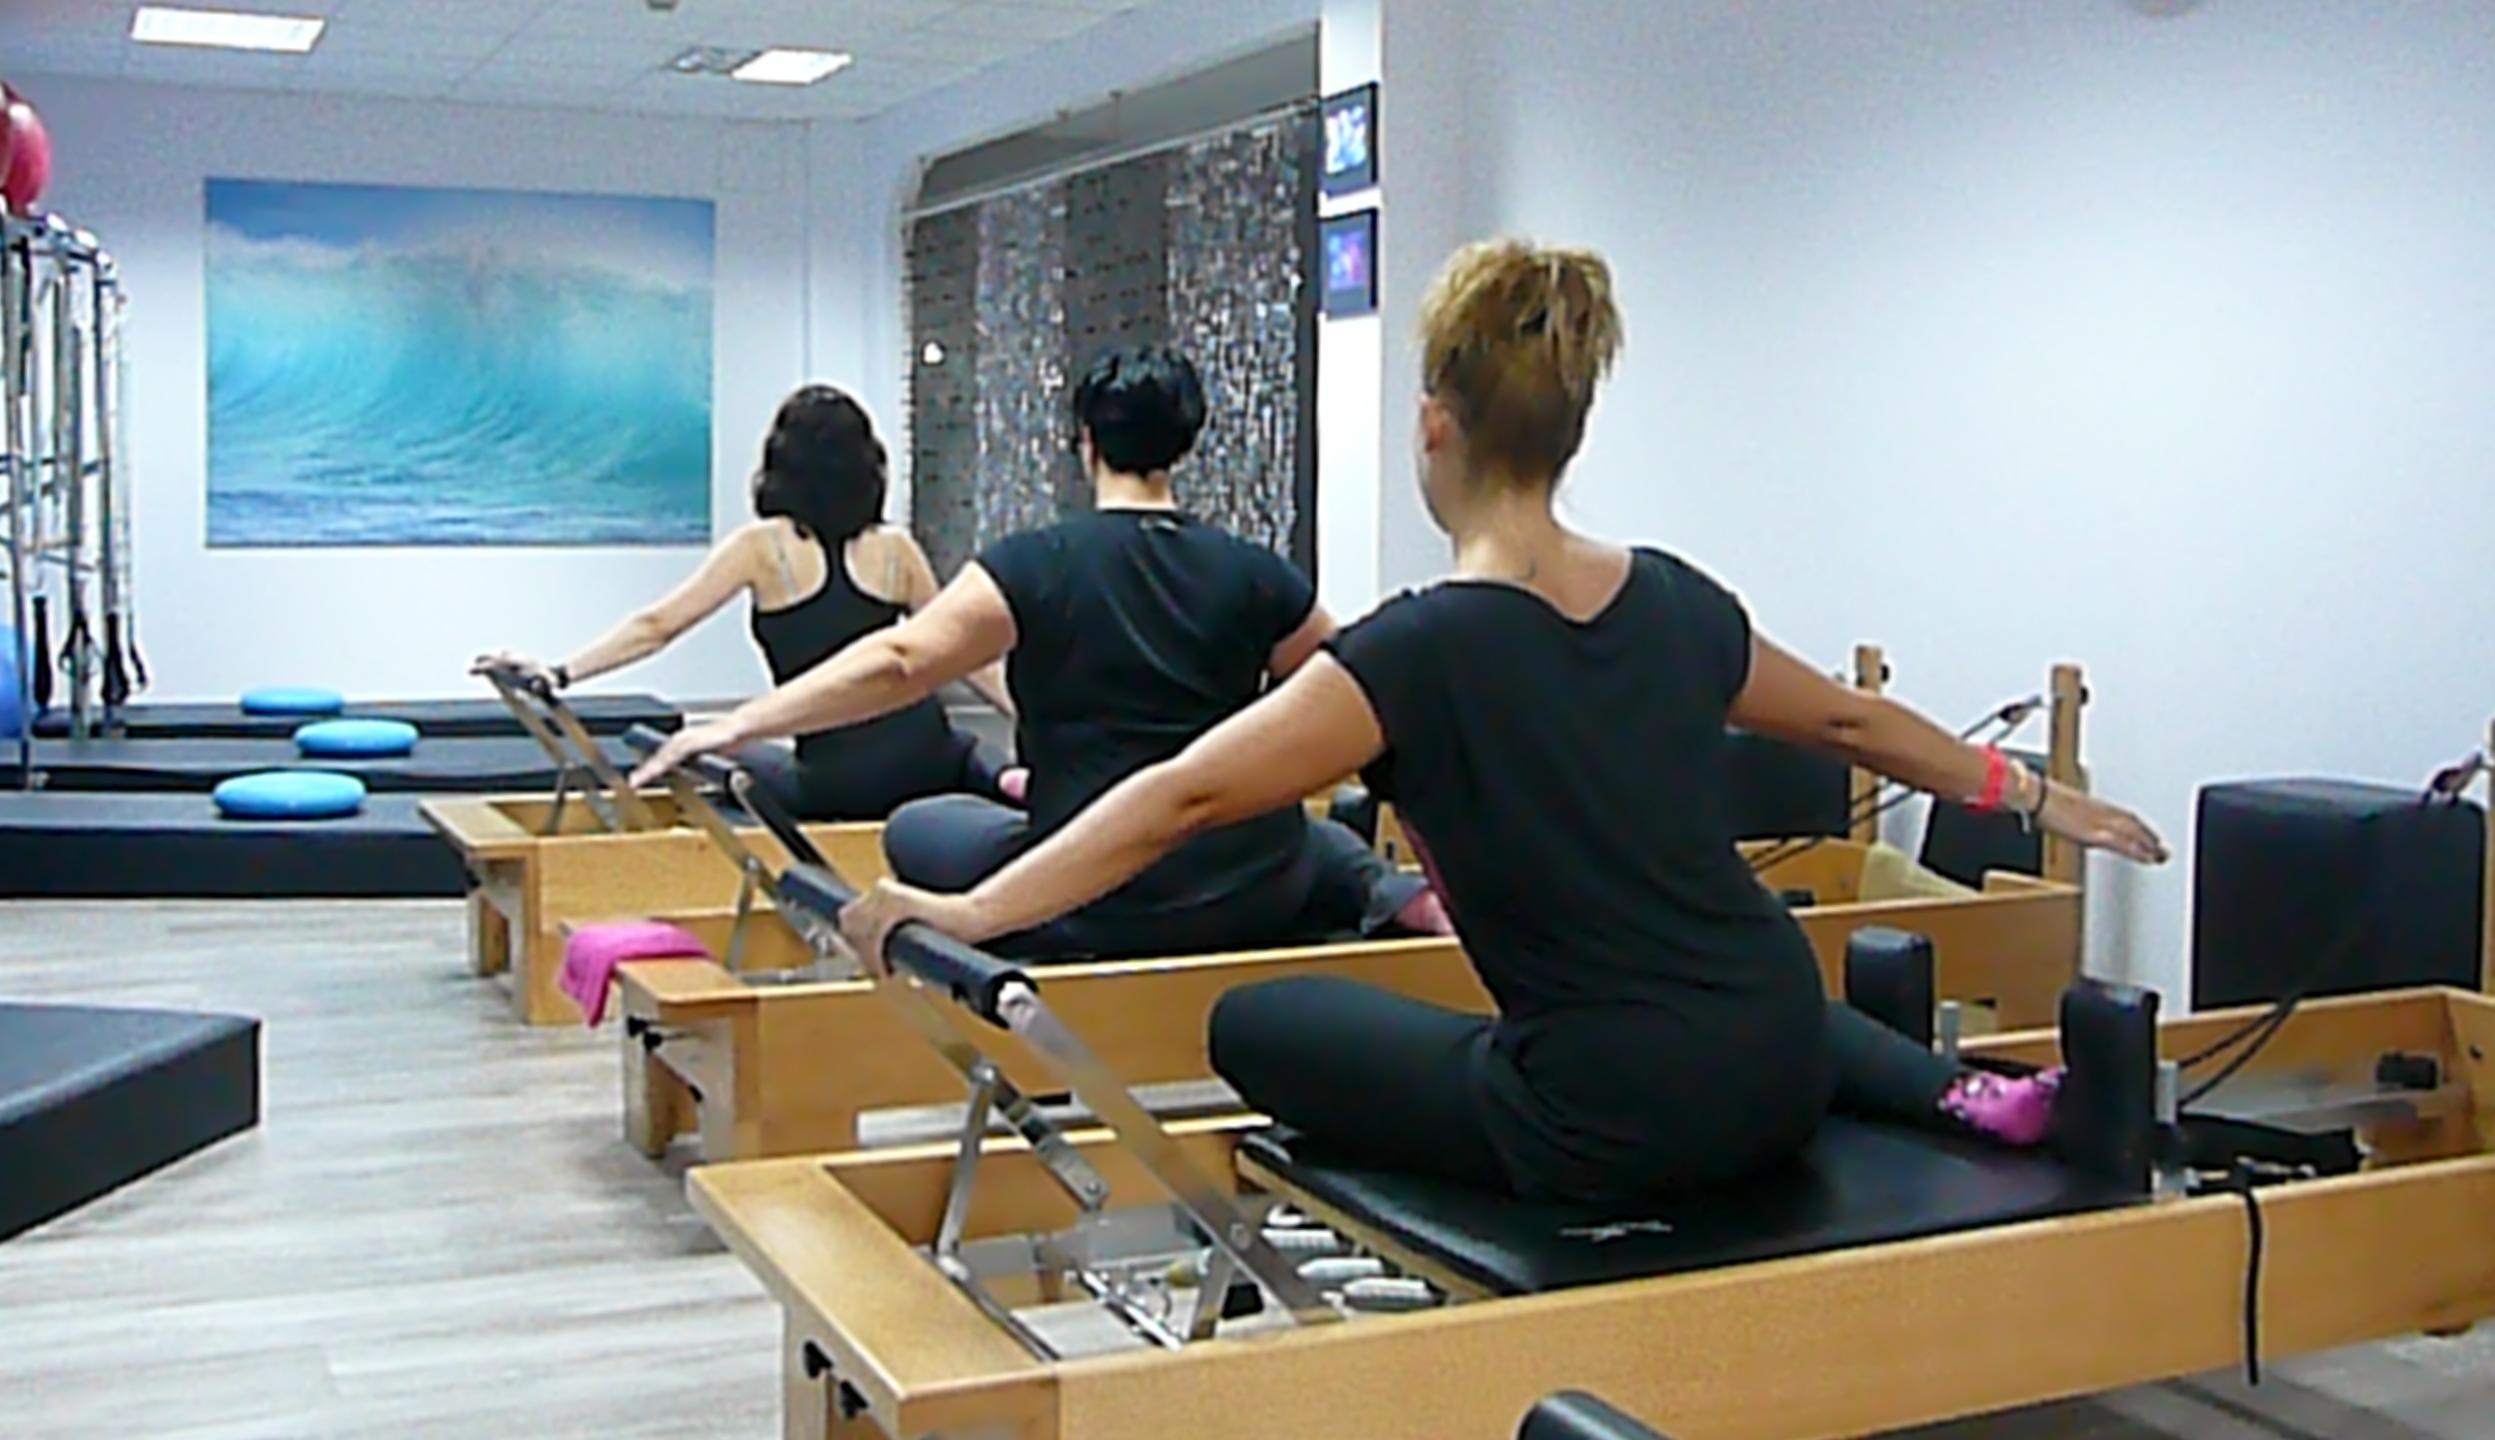 Sistema completo de Pilates